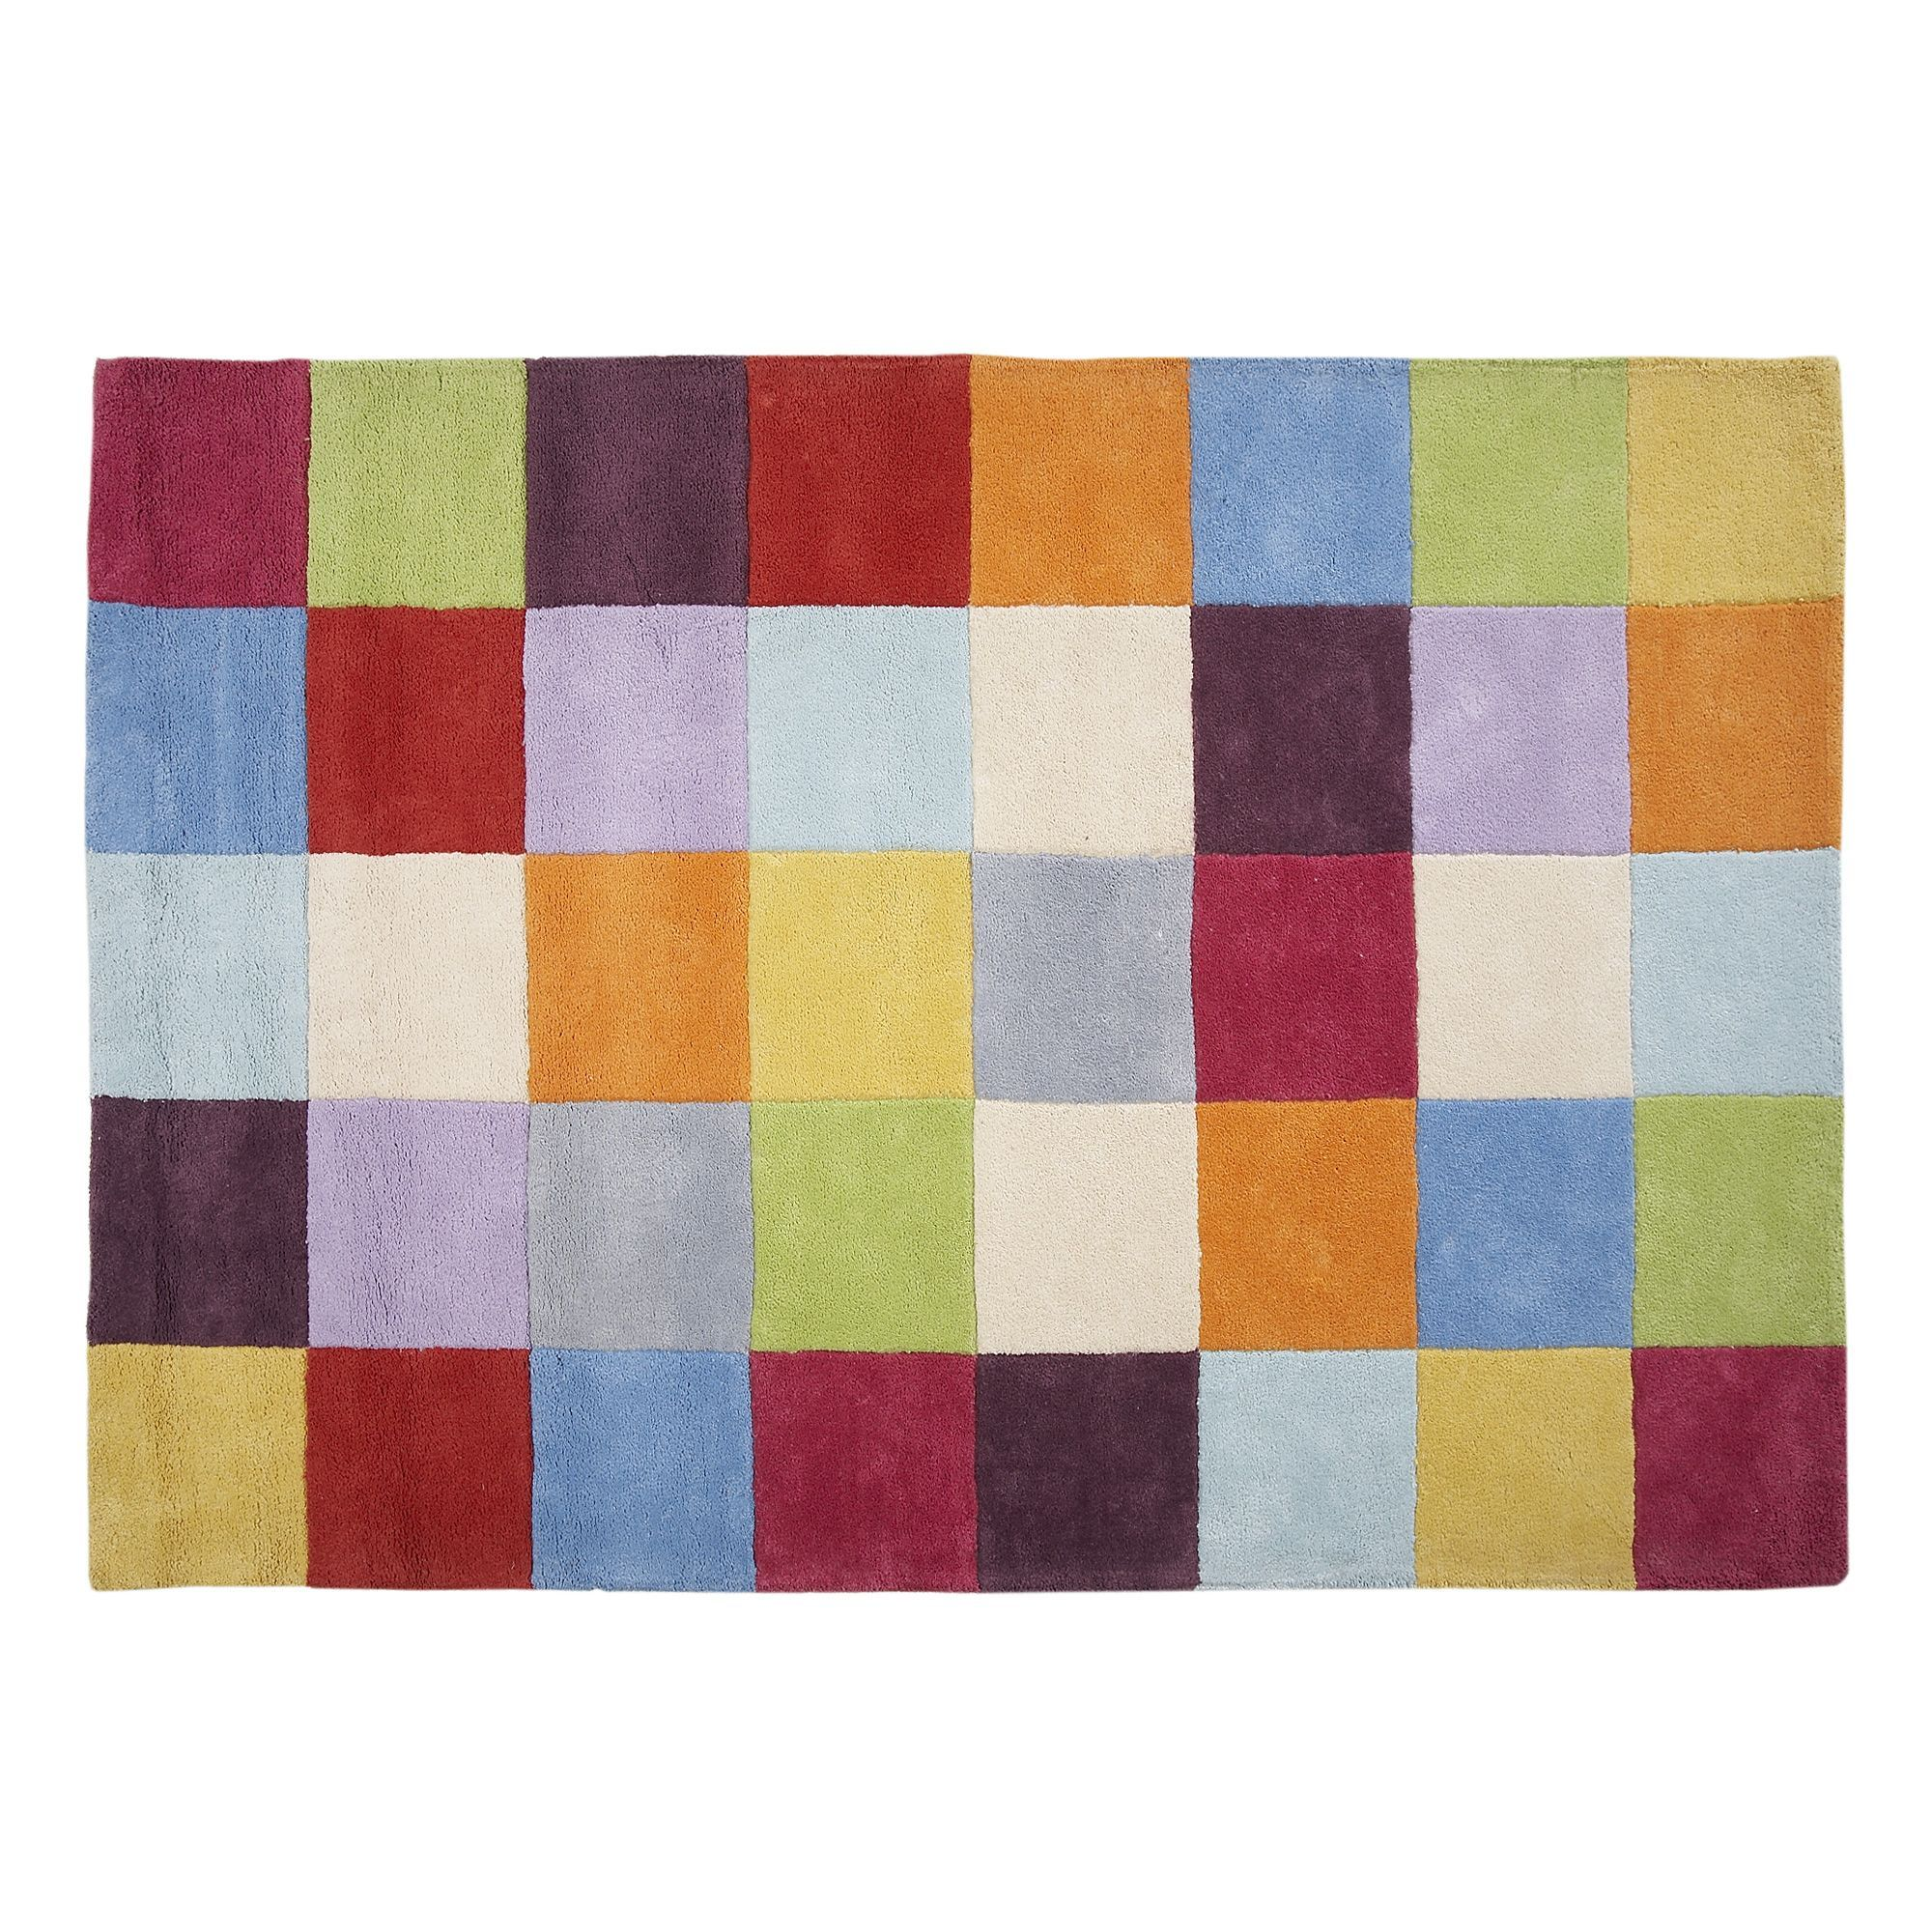 tapis multicolore 140x200cm multicolore game les tapis. Black Bedroom Furniture Sets. Home Design Ideas